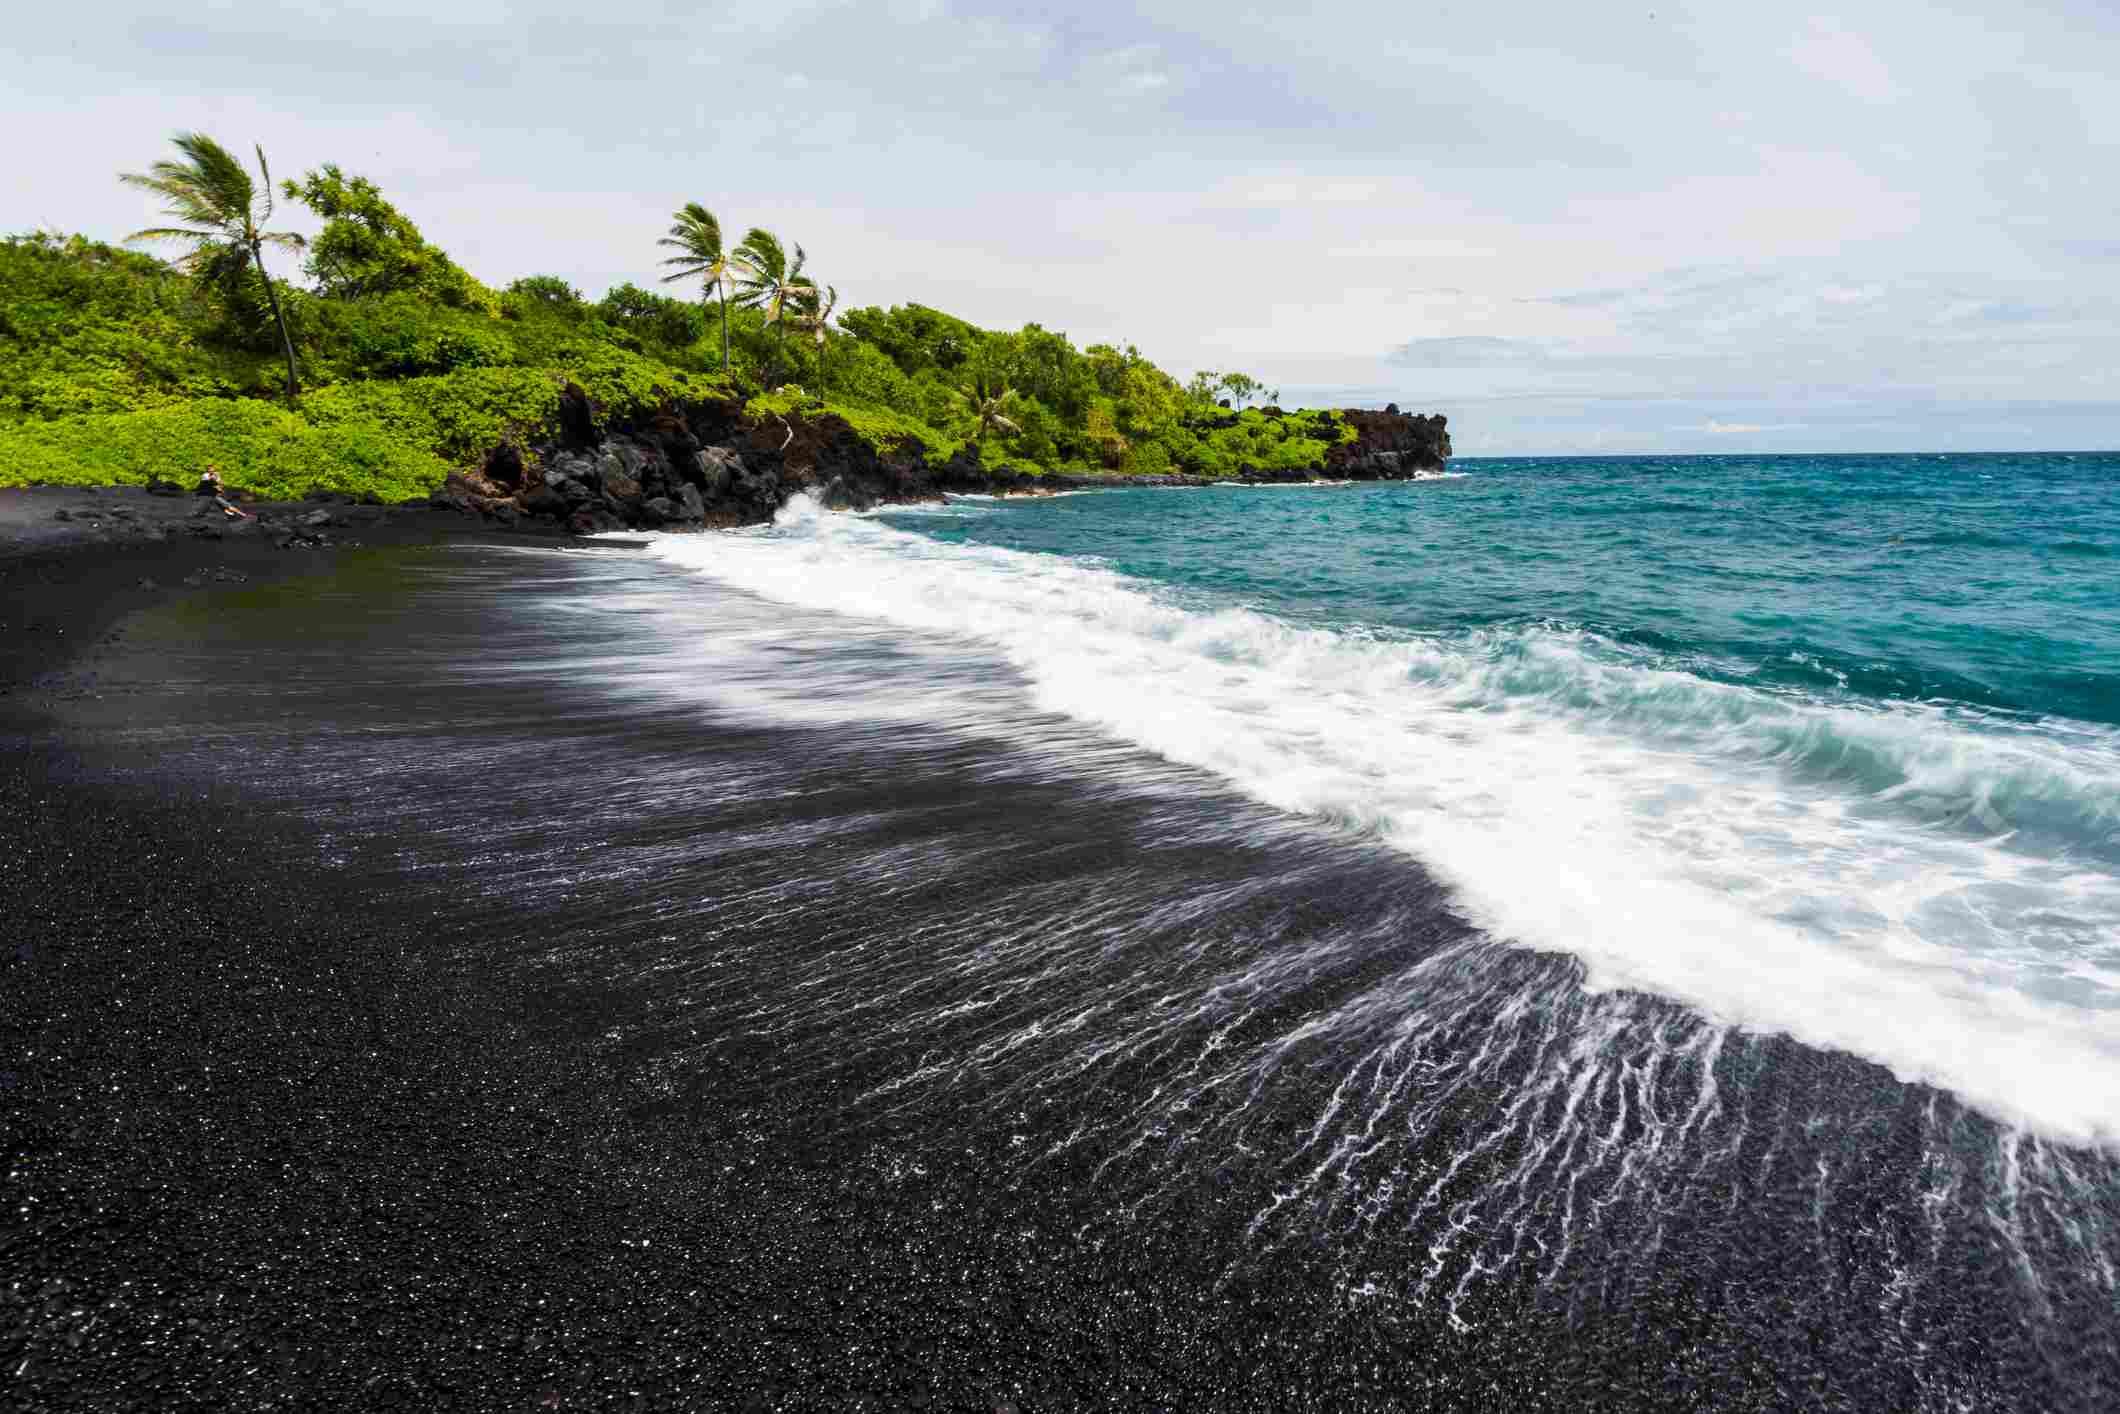 Black Sand beach at the road to Hana.